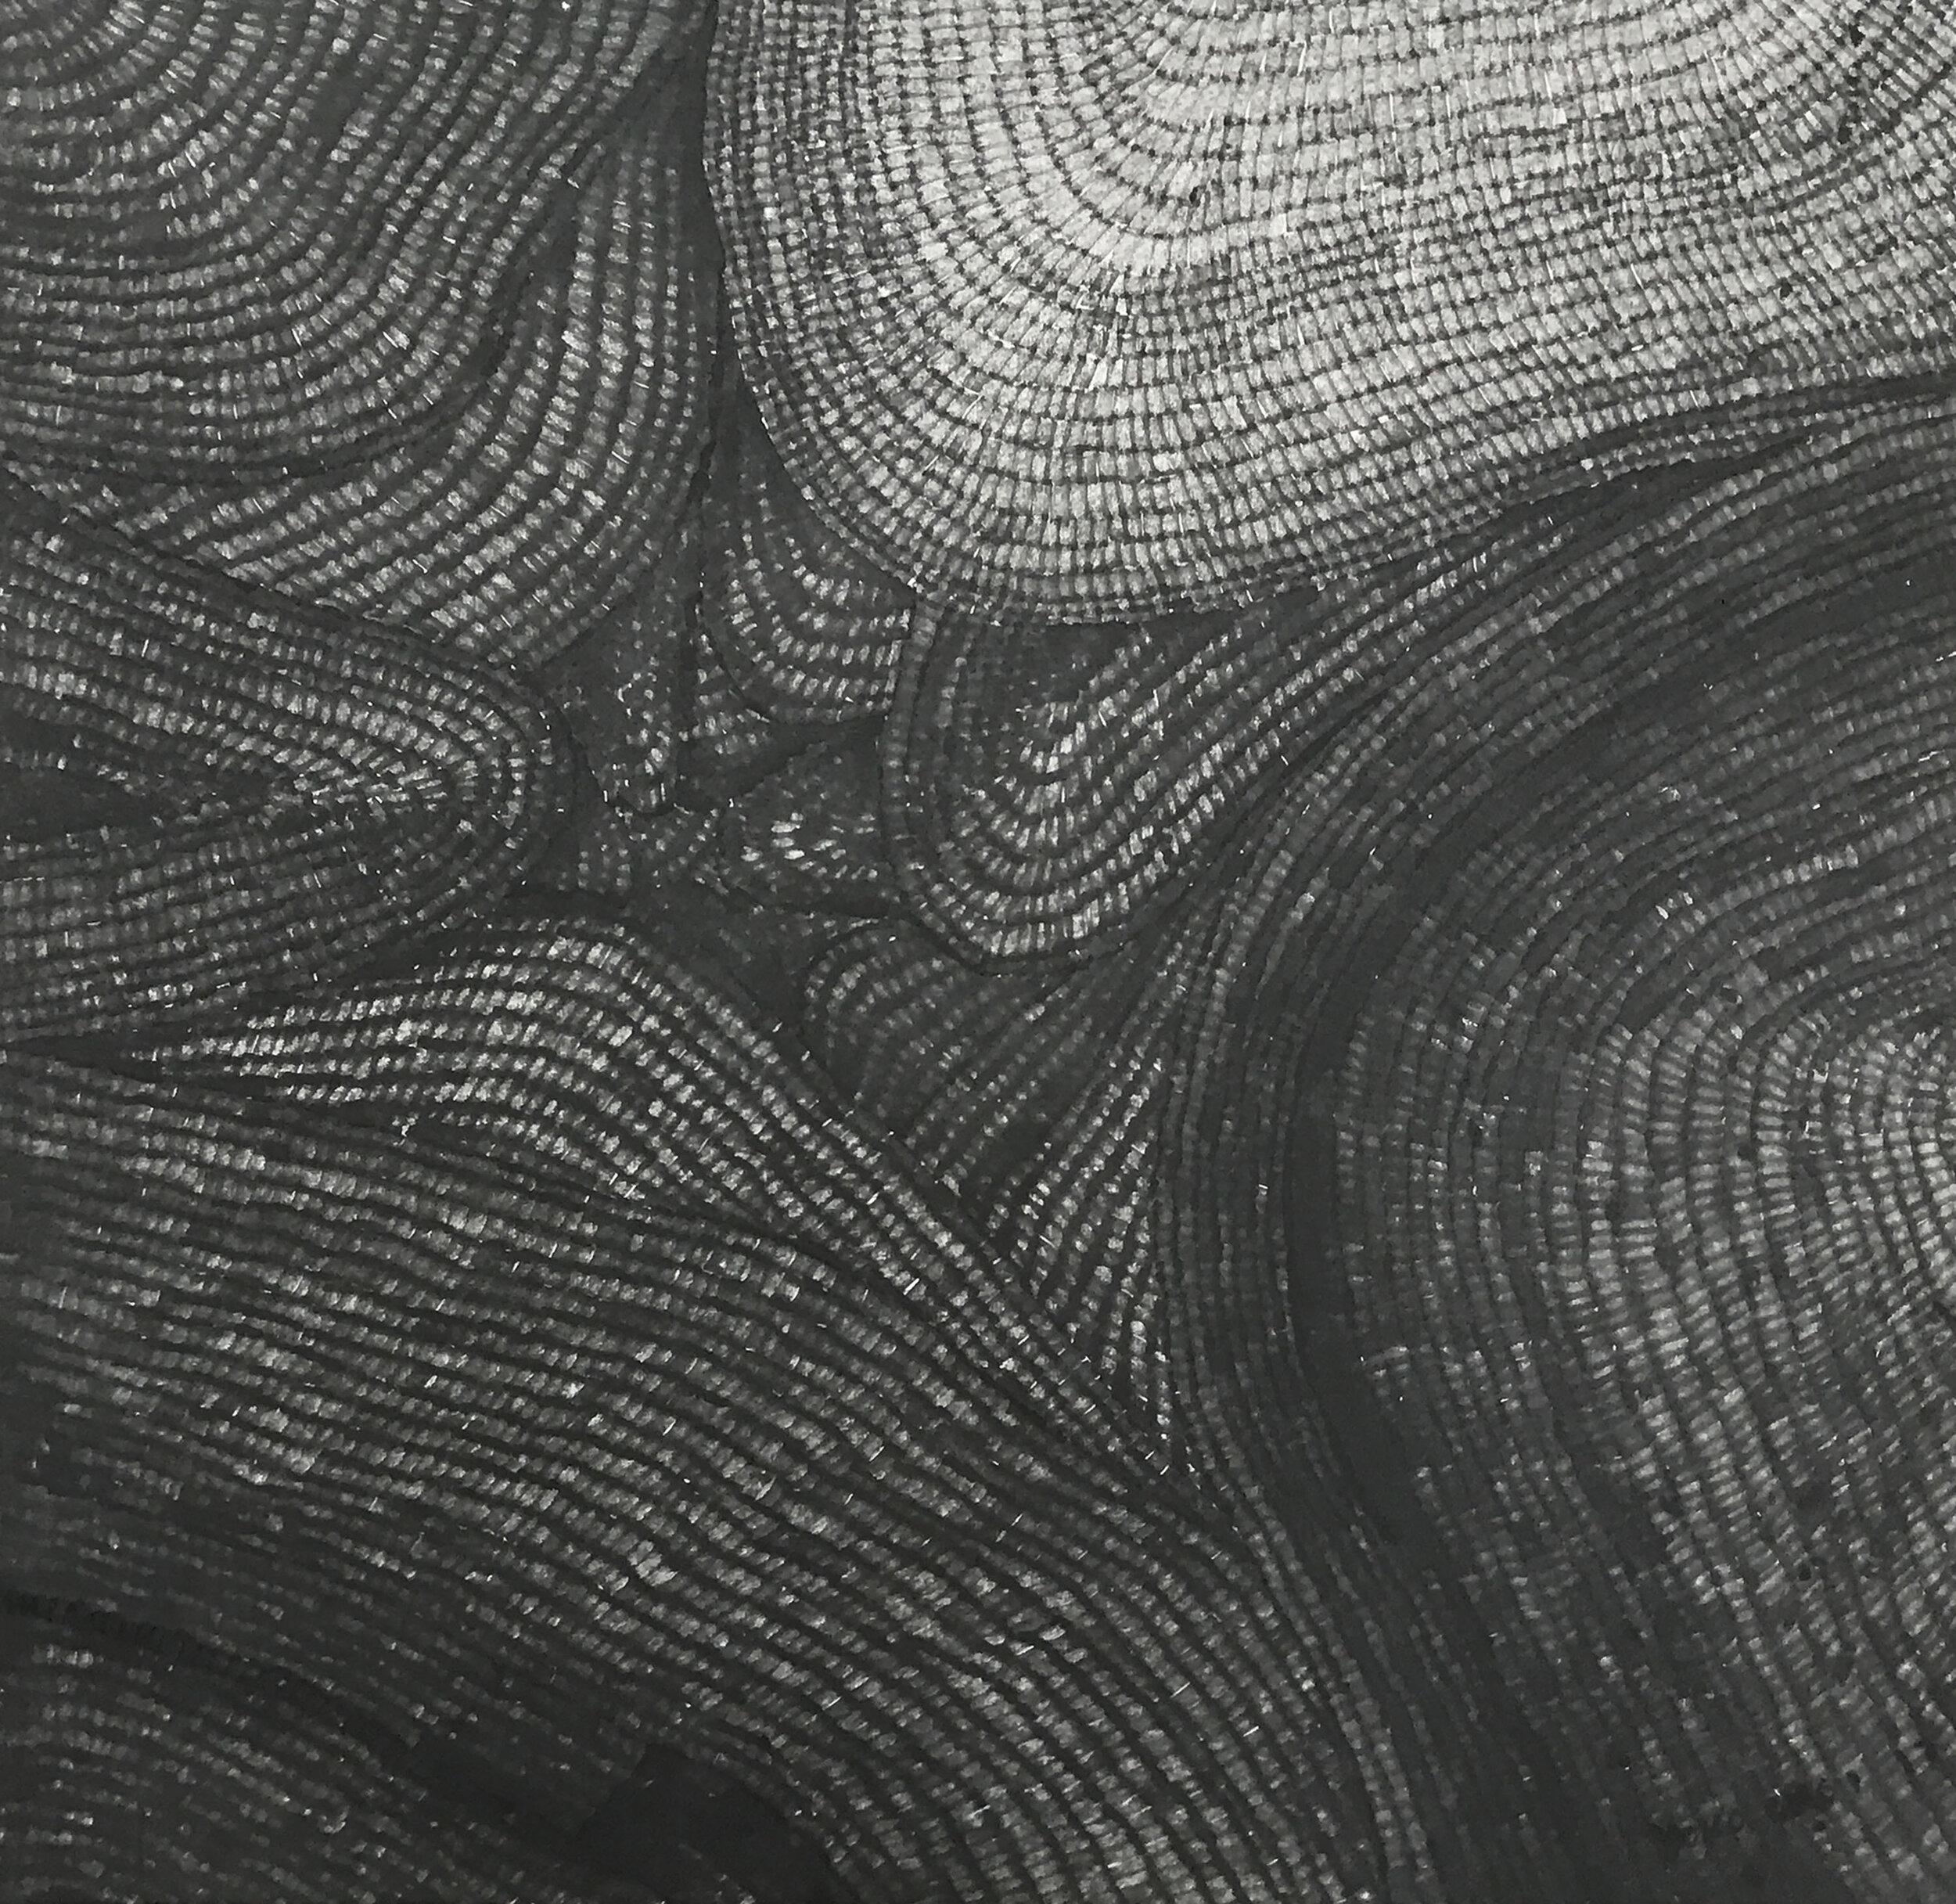 Summit, 2017, marker pen on rice paper, 50 cm x 50 cm, 2800